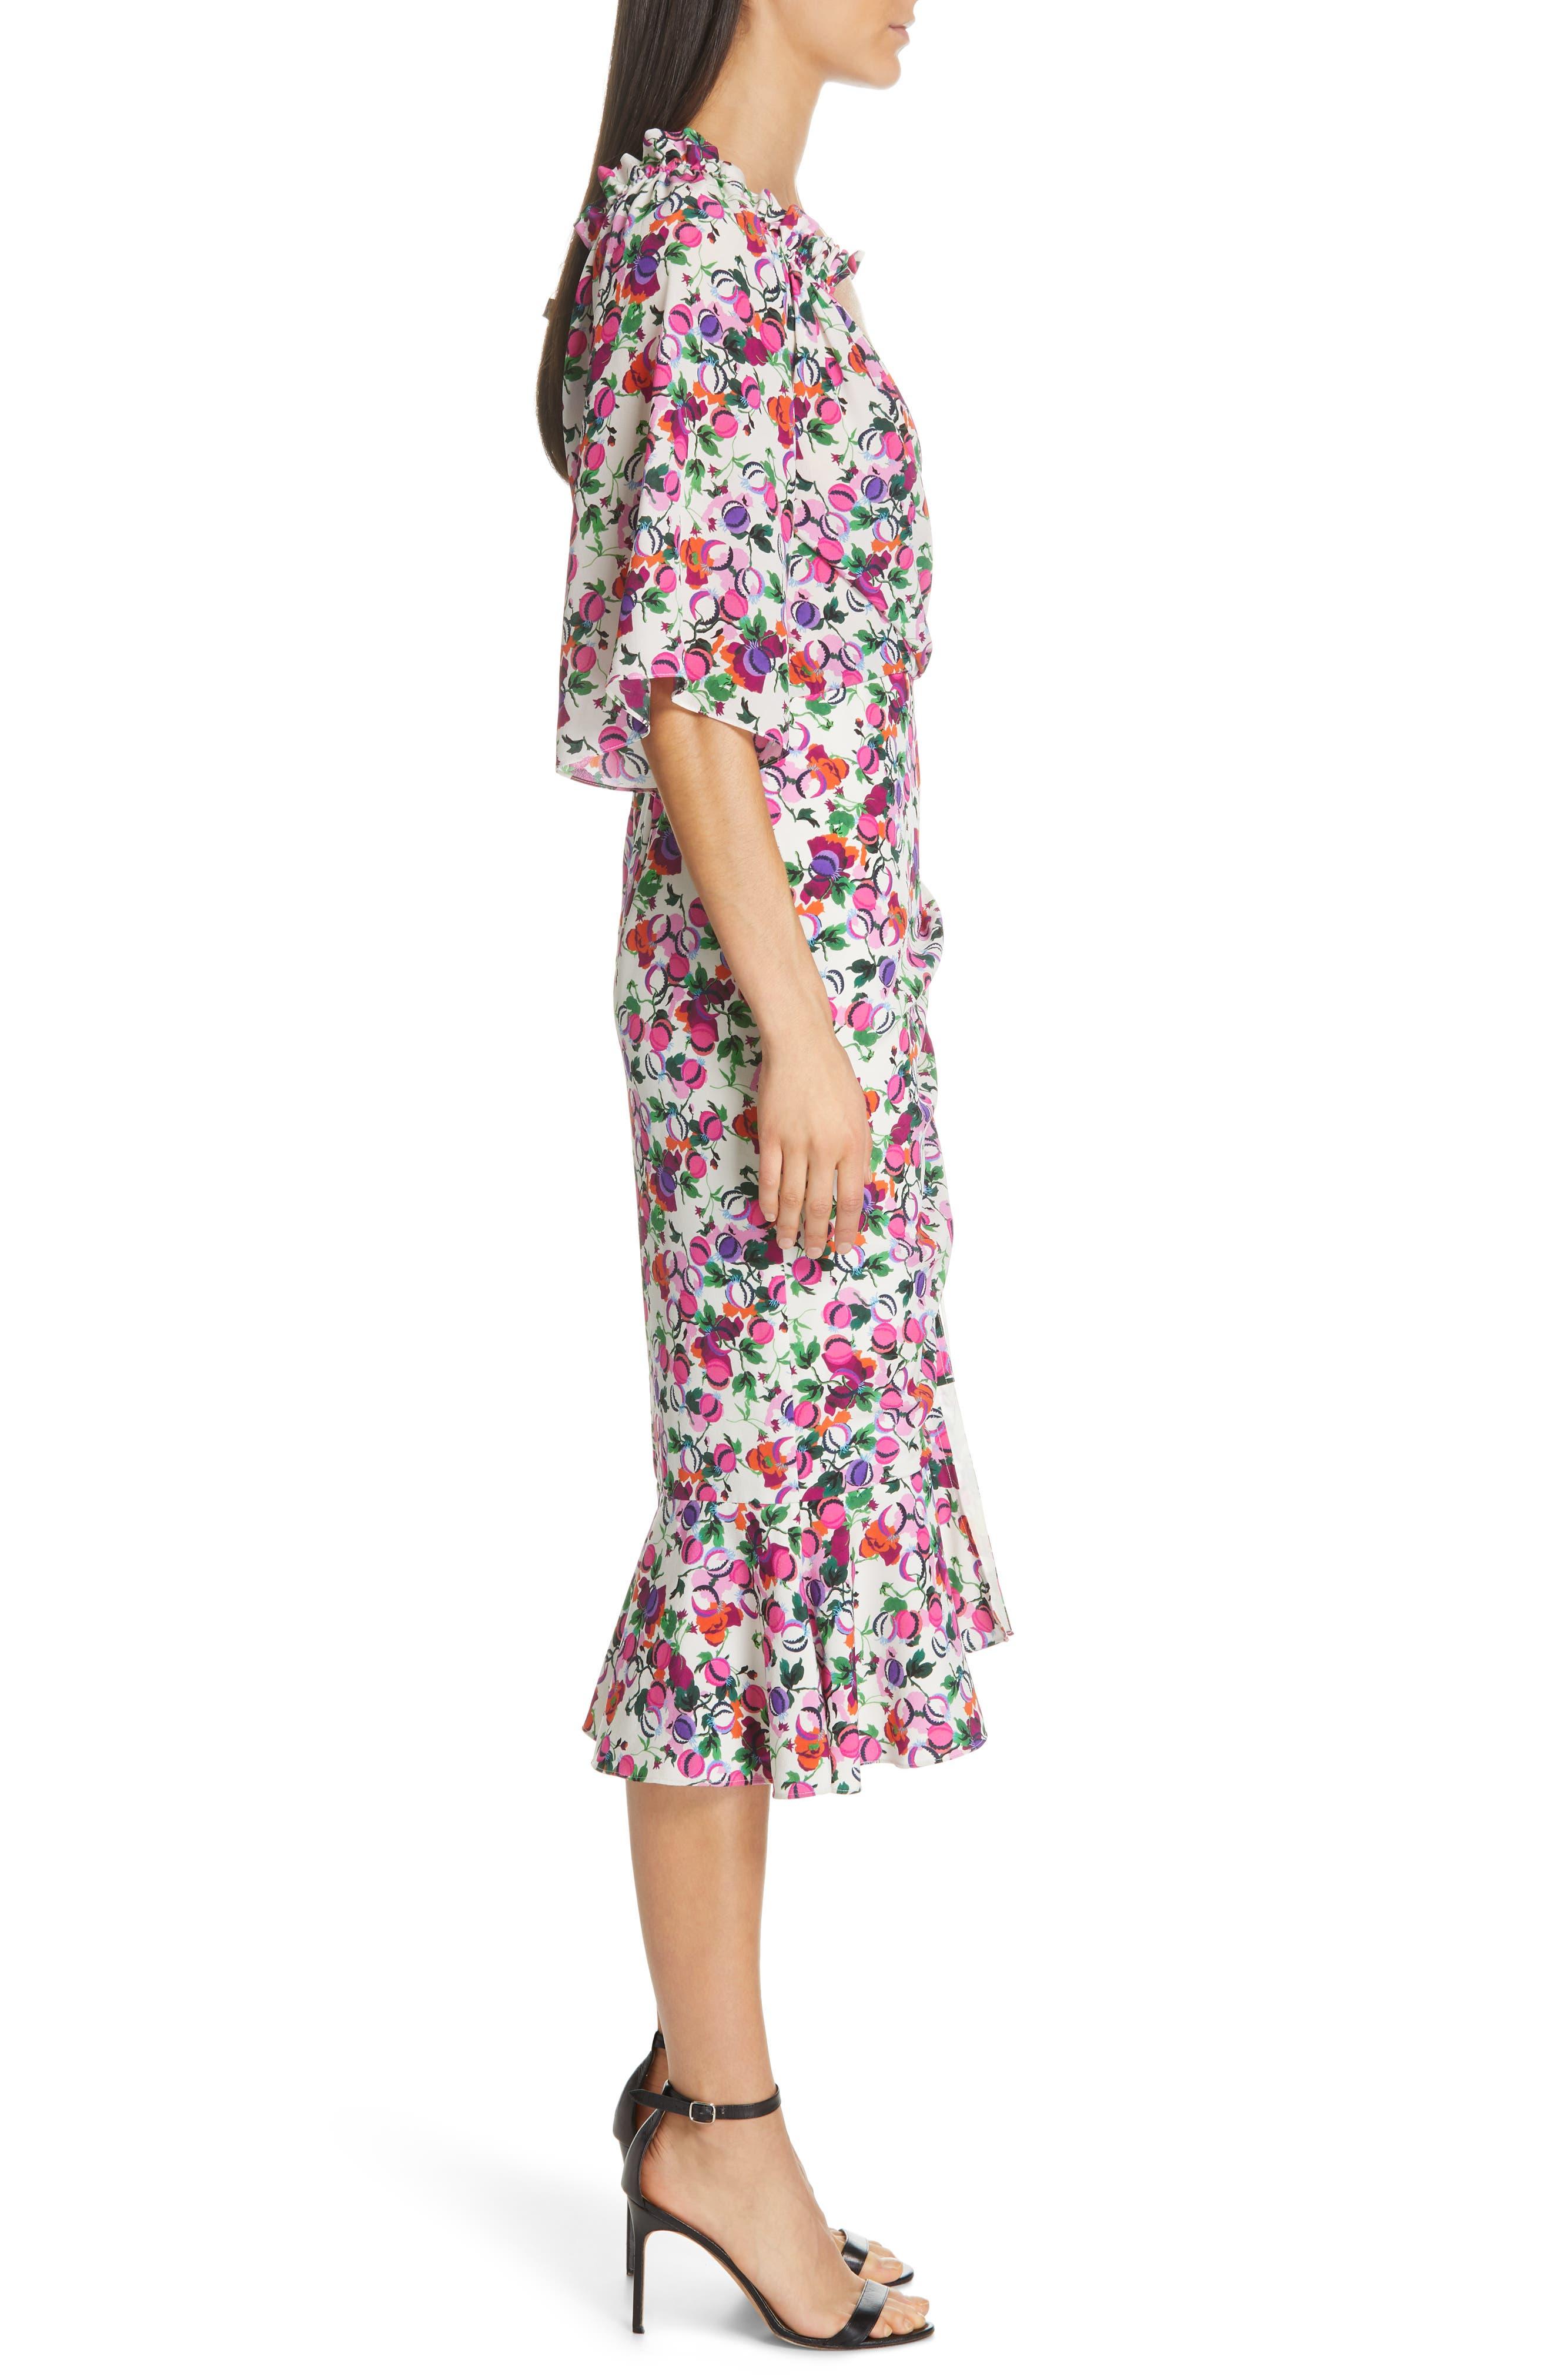 SALONI, Olivia Floral Print Off the Shoulder Midi Dress, Alternate thumbnail 3, color, ROSE BOUNTY BLACK